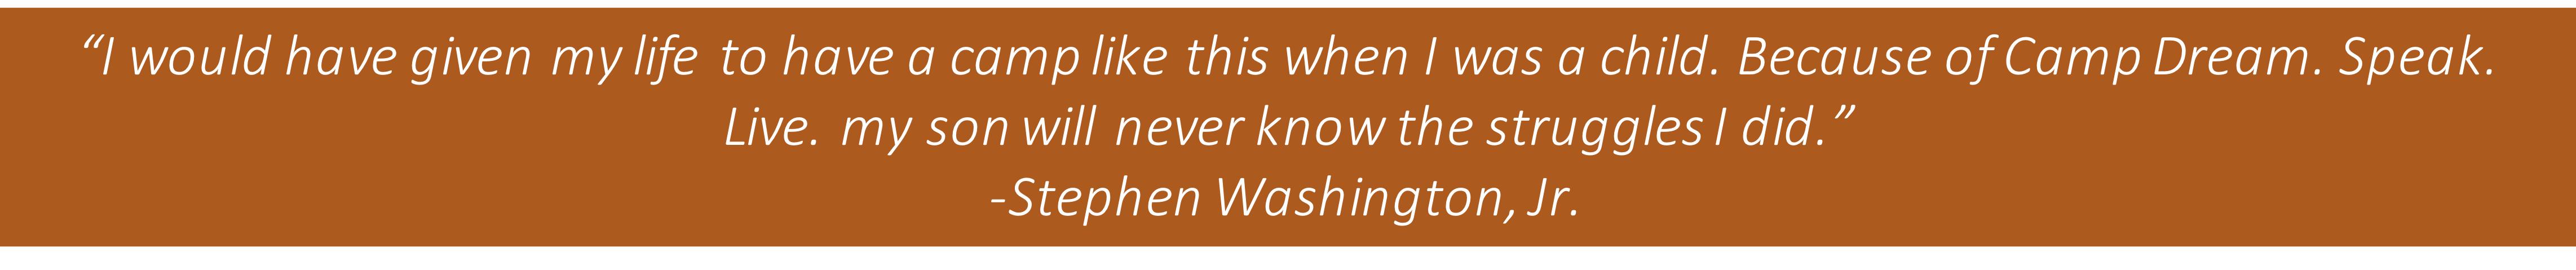 Stephen Washington Quote